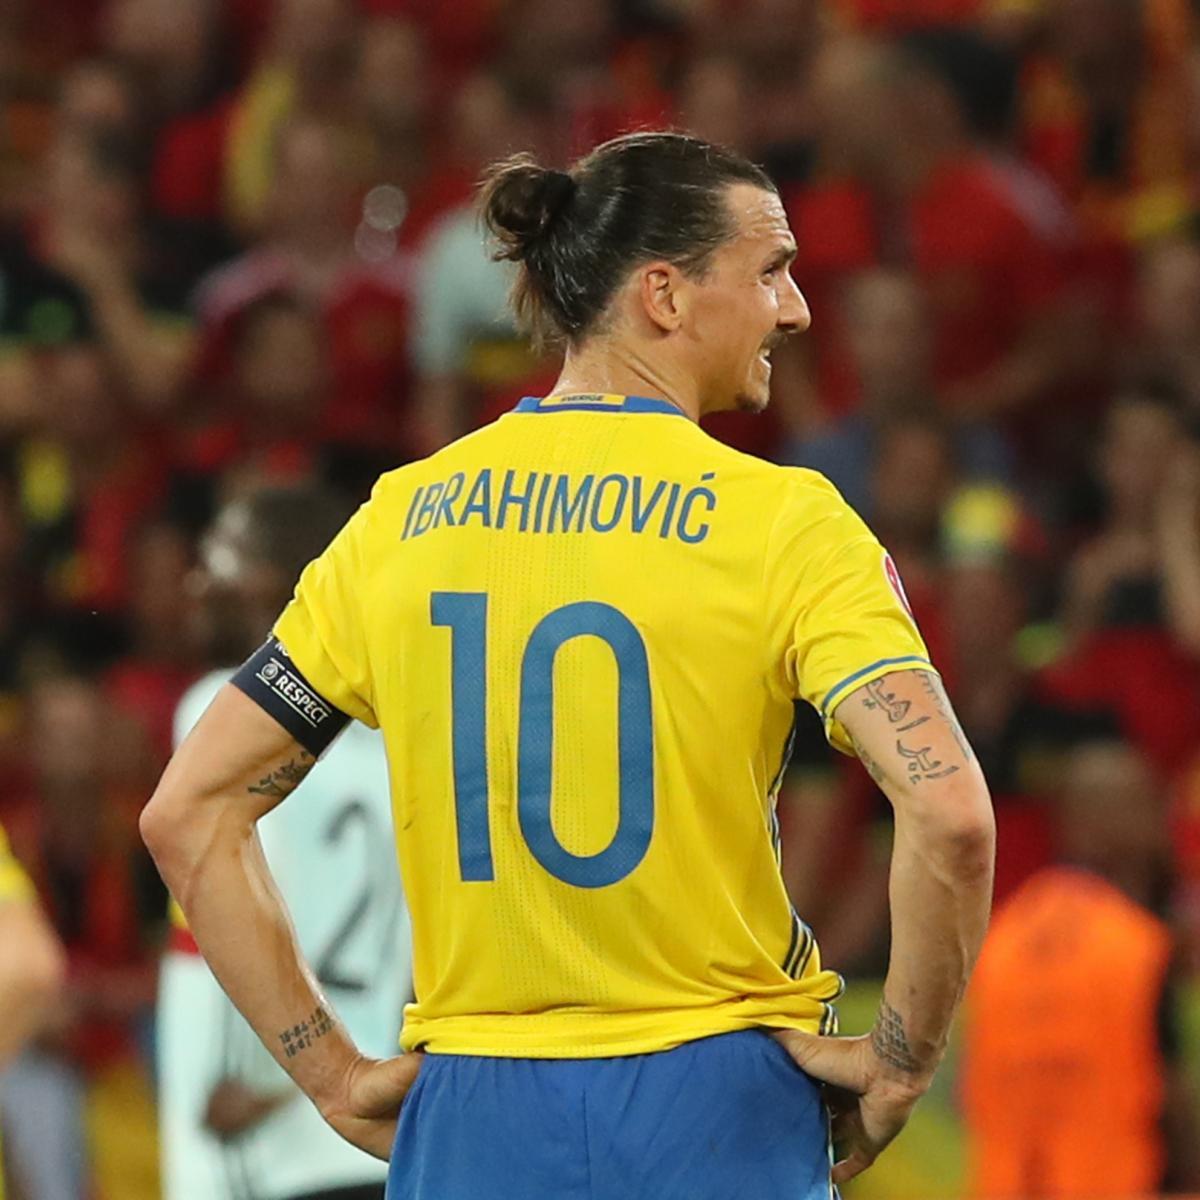 Zlatan Ibrahimovic Considering Sweden National Team Return for 2018 World Cup